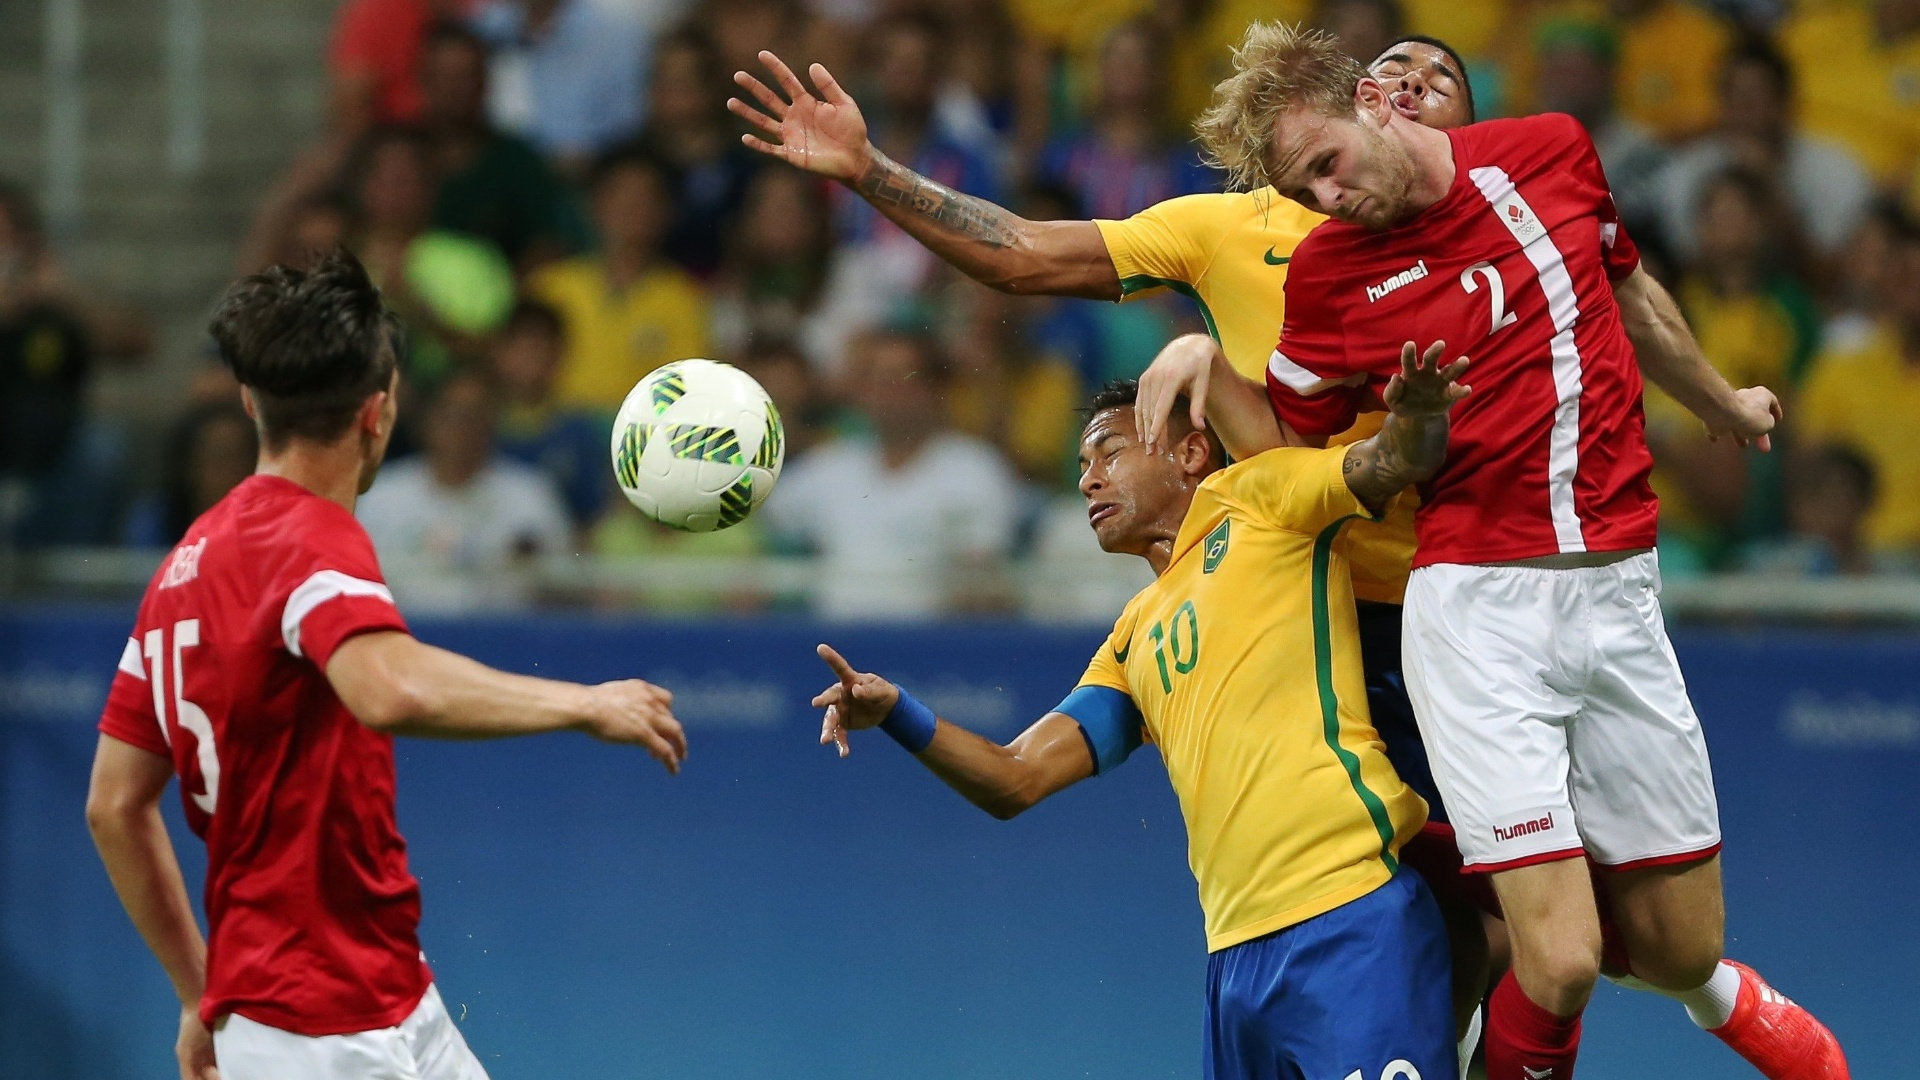 Neymar na disputa de bola com Desler Puggaard da Dinamarca